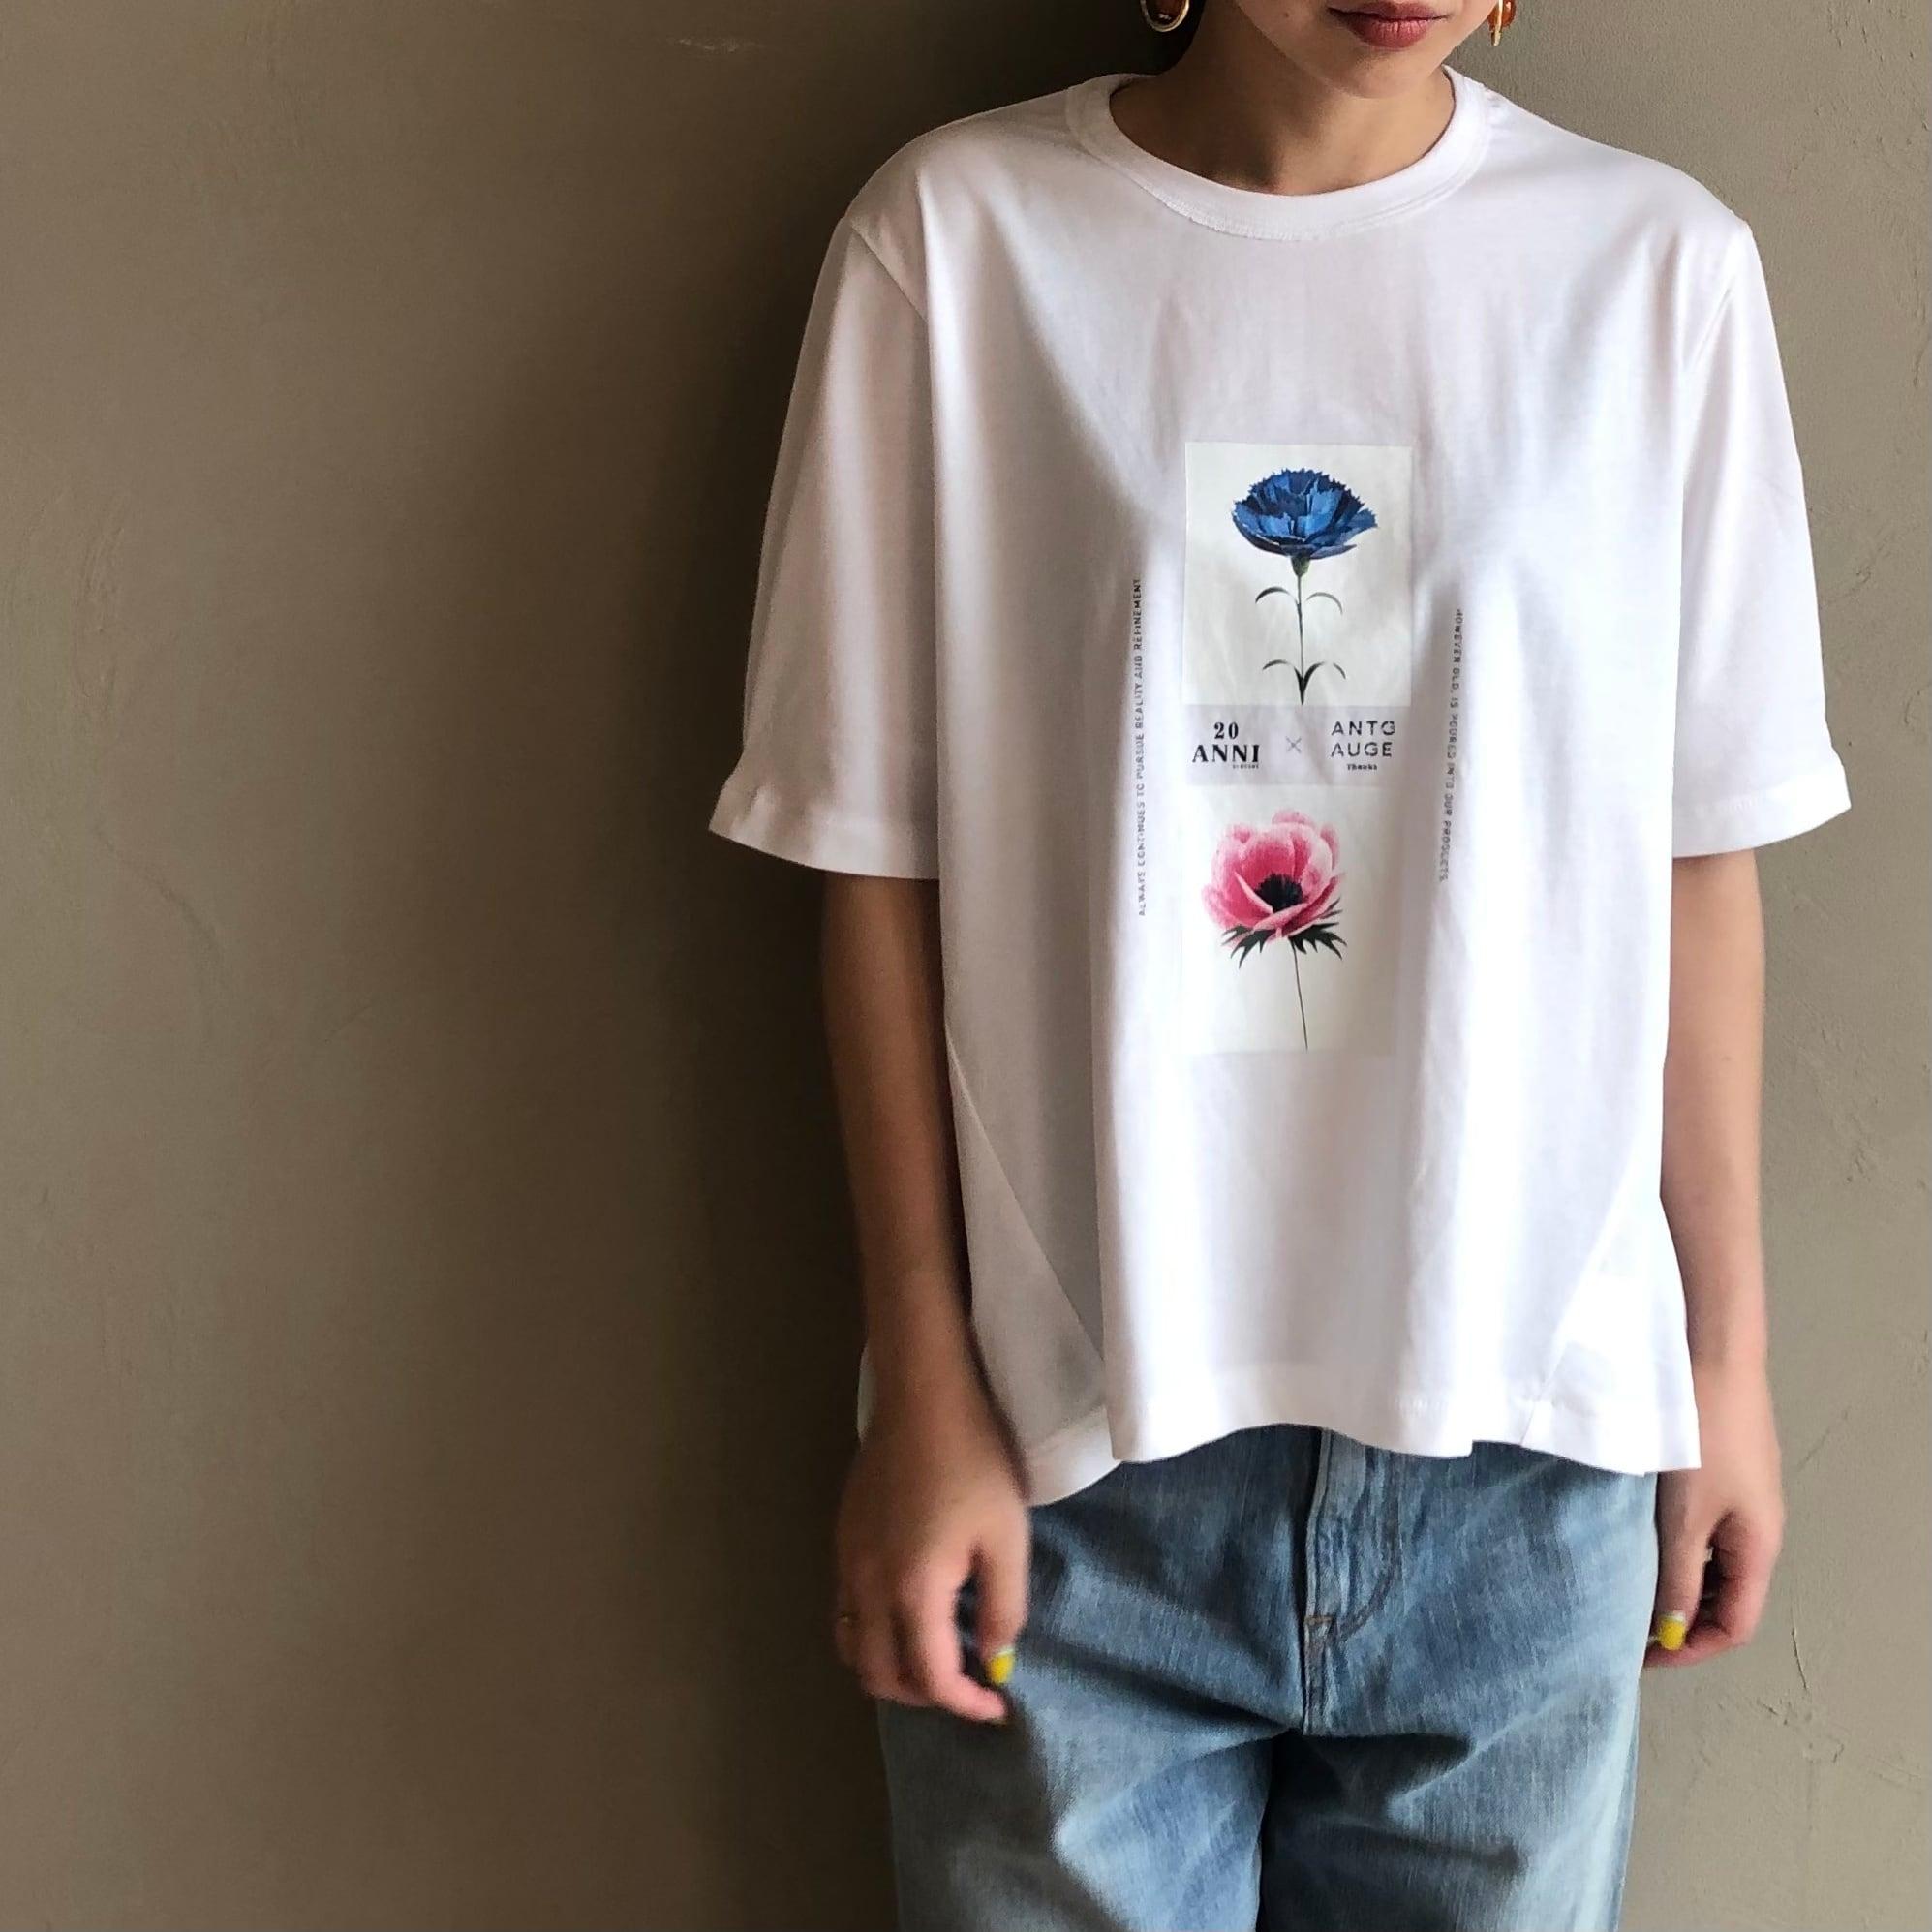 【 ANTGAUGE 】- AB962 - フラワープリント袖タックTシャツ